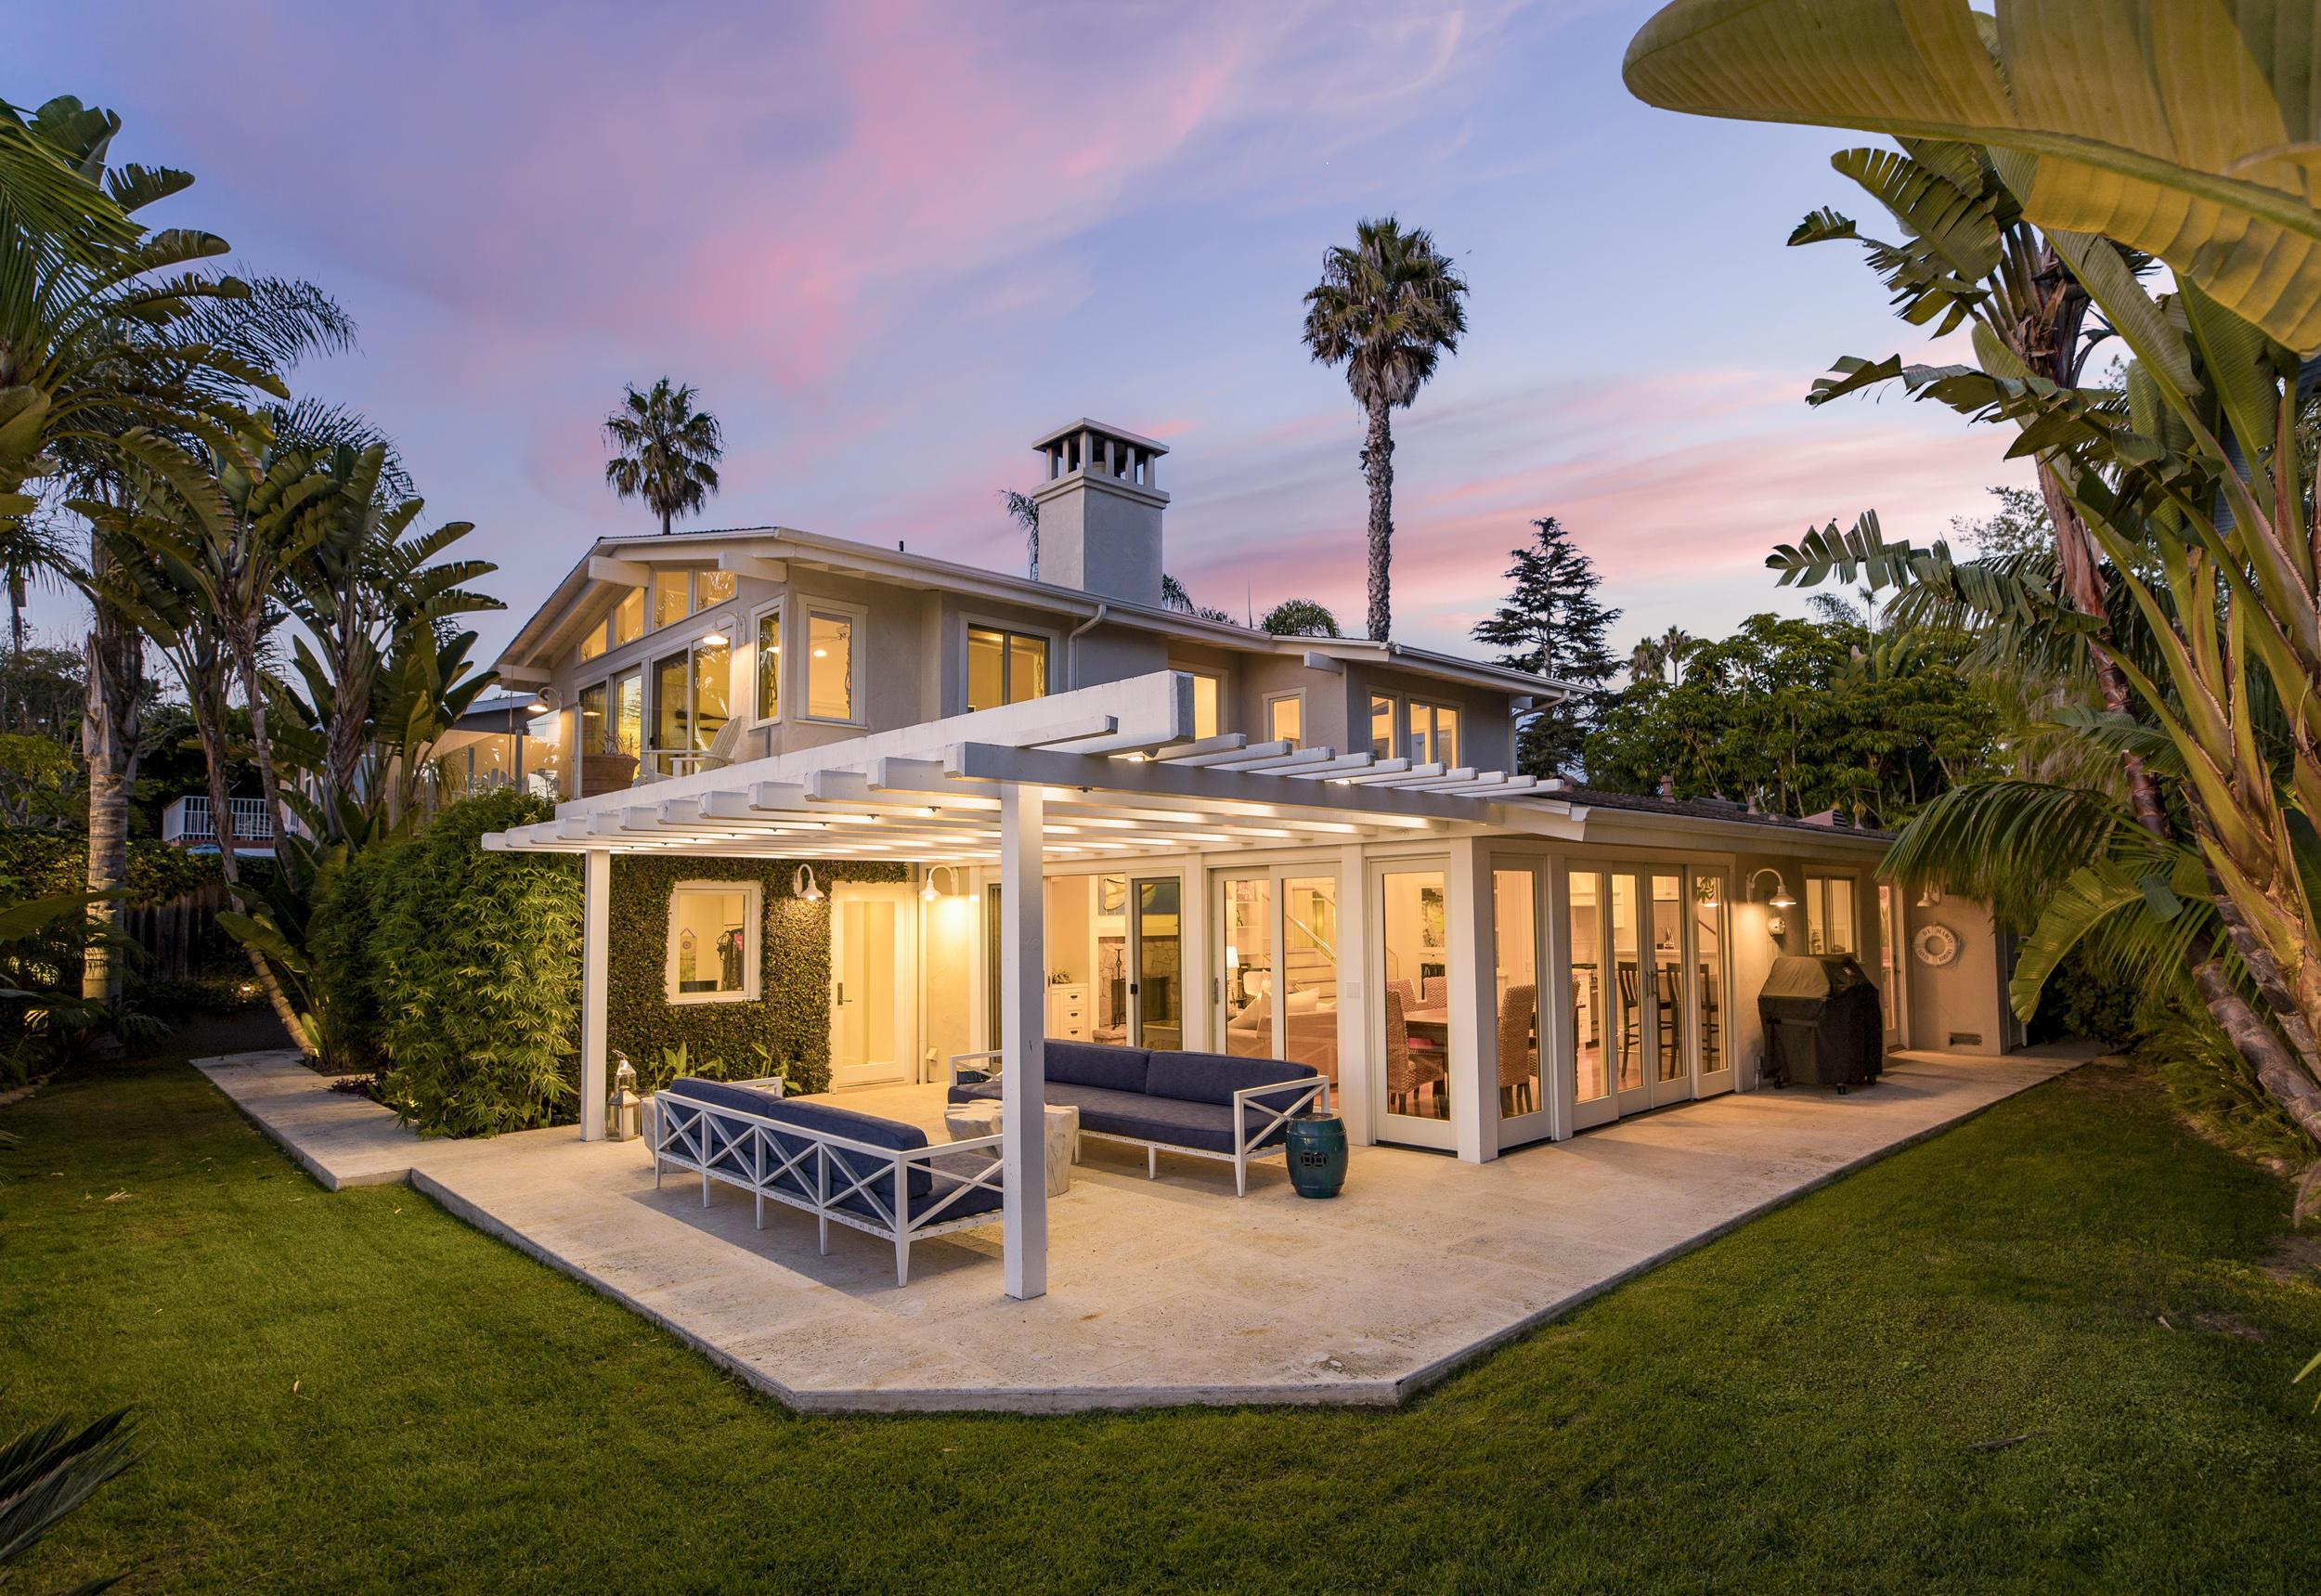 Property photo for 827 Margo St Santa Barbara, California 93109 - 18-3849